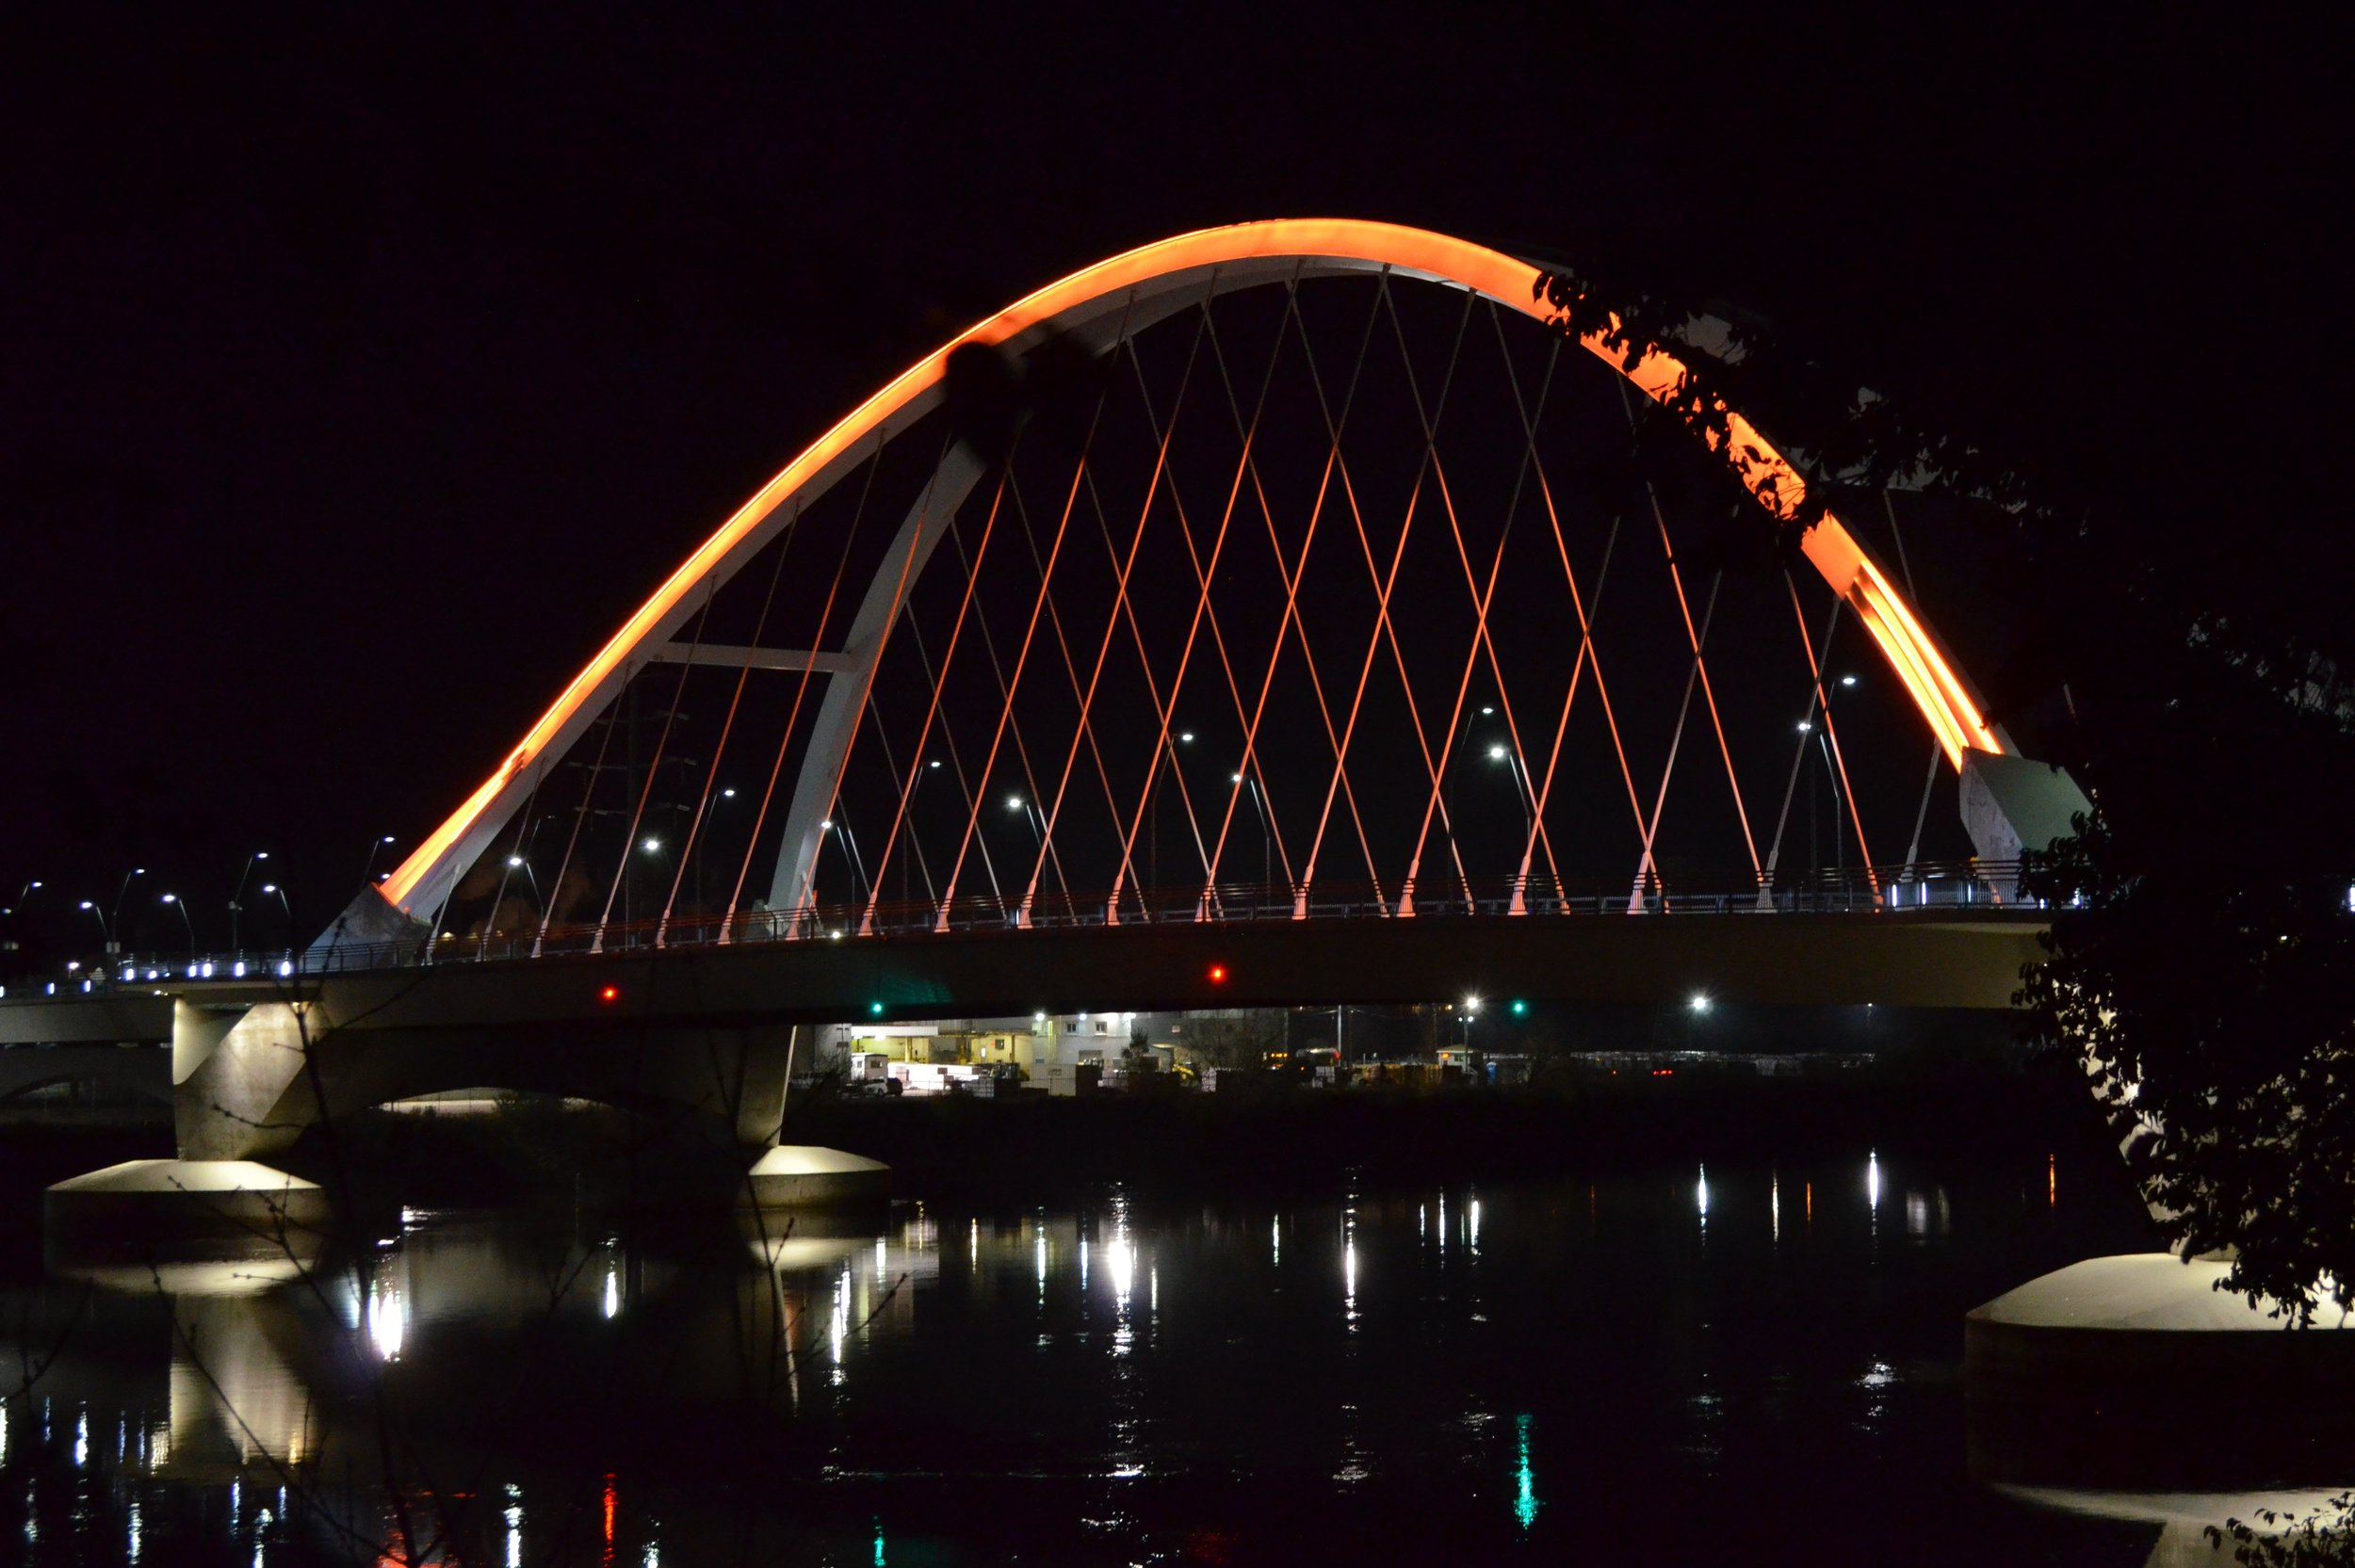 lowry avenue bridge 2 (2).JPG